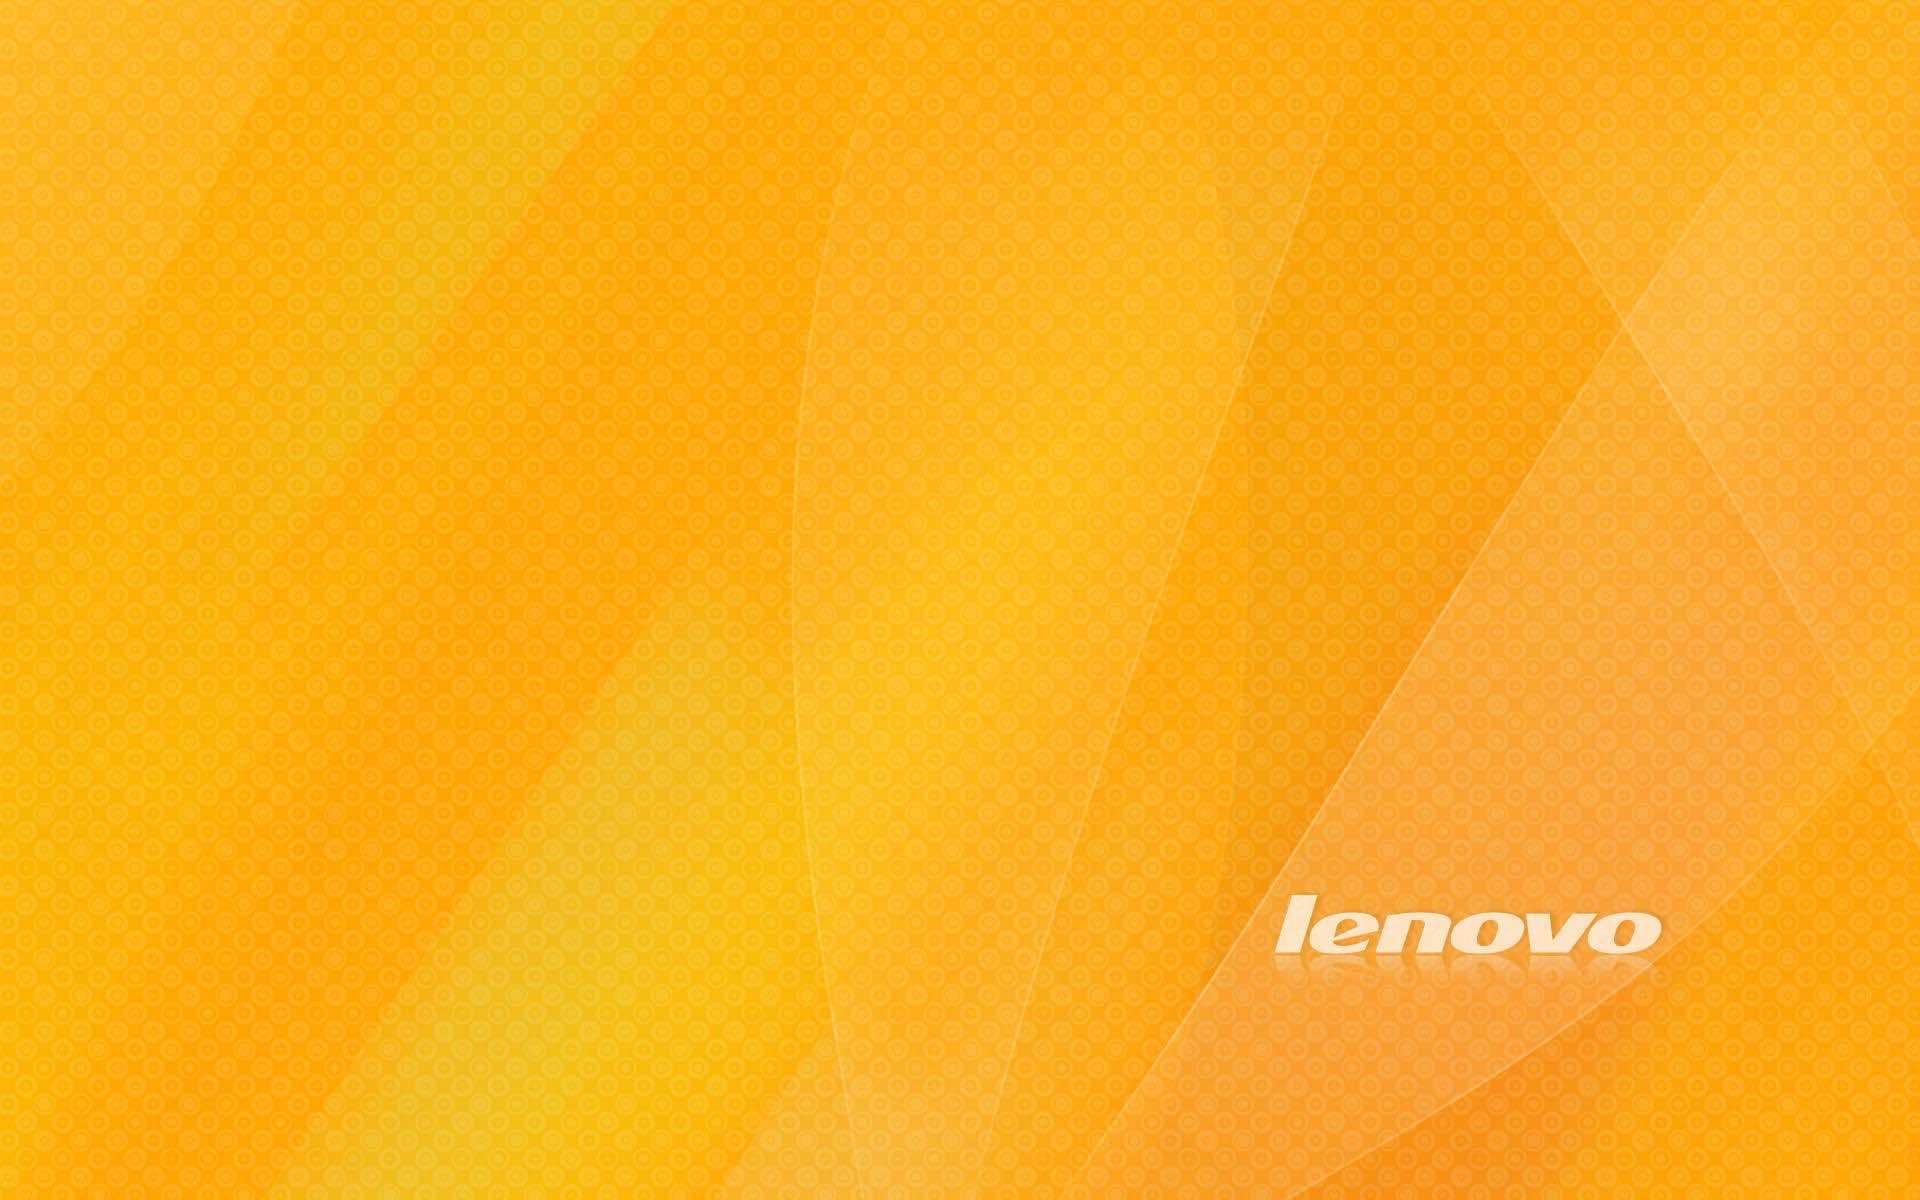 Lenovo Mobile Wallpaper: Lenovo Wallpaper Collection In HD For Download